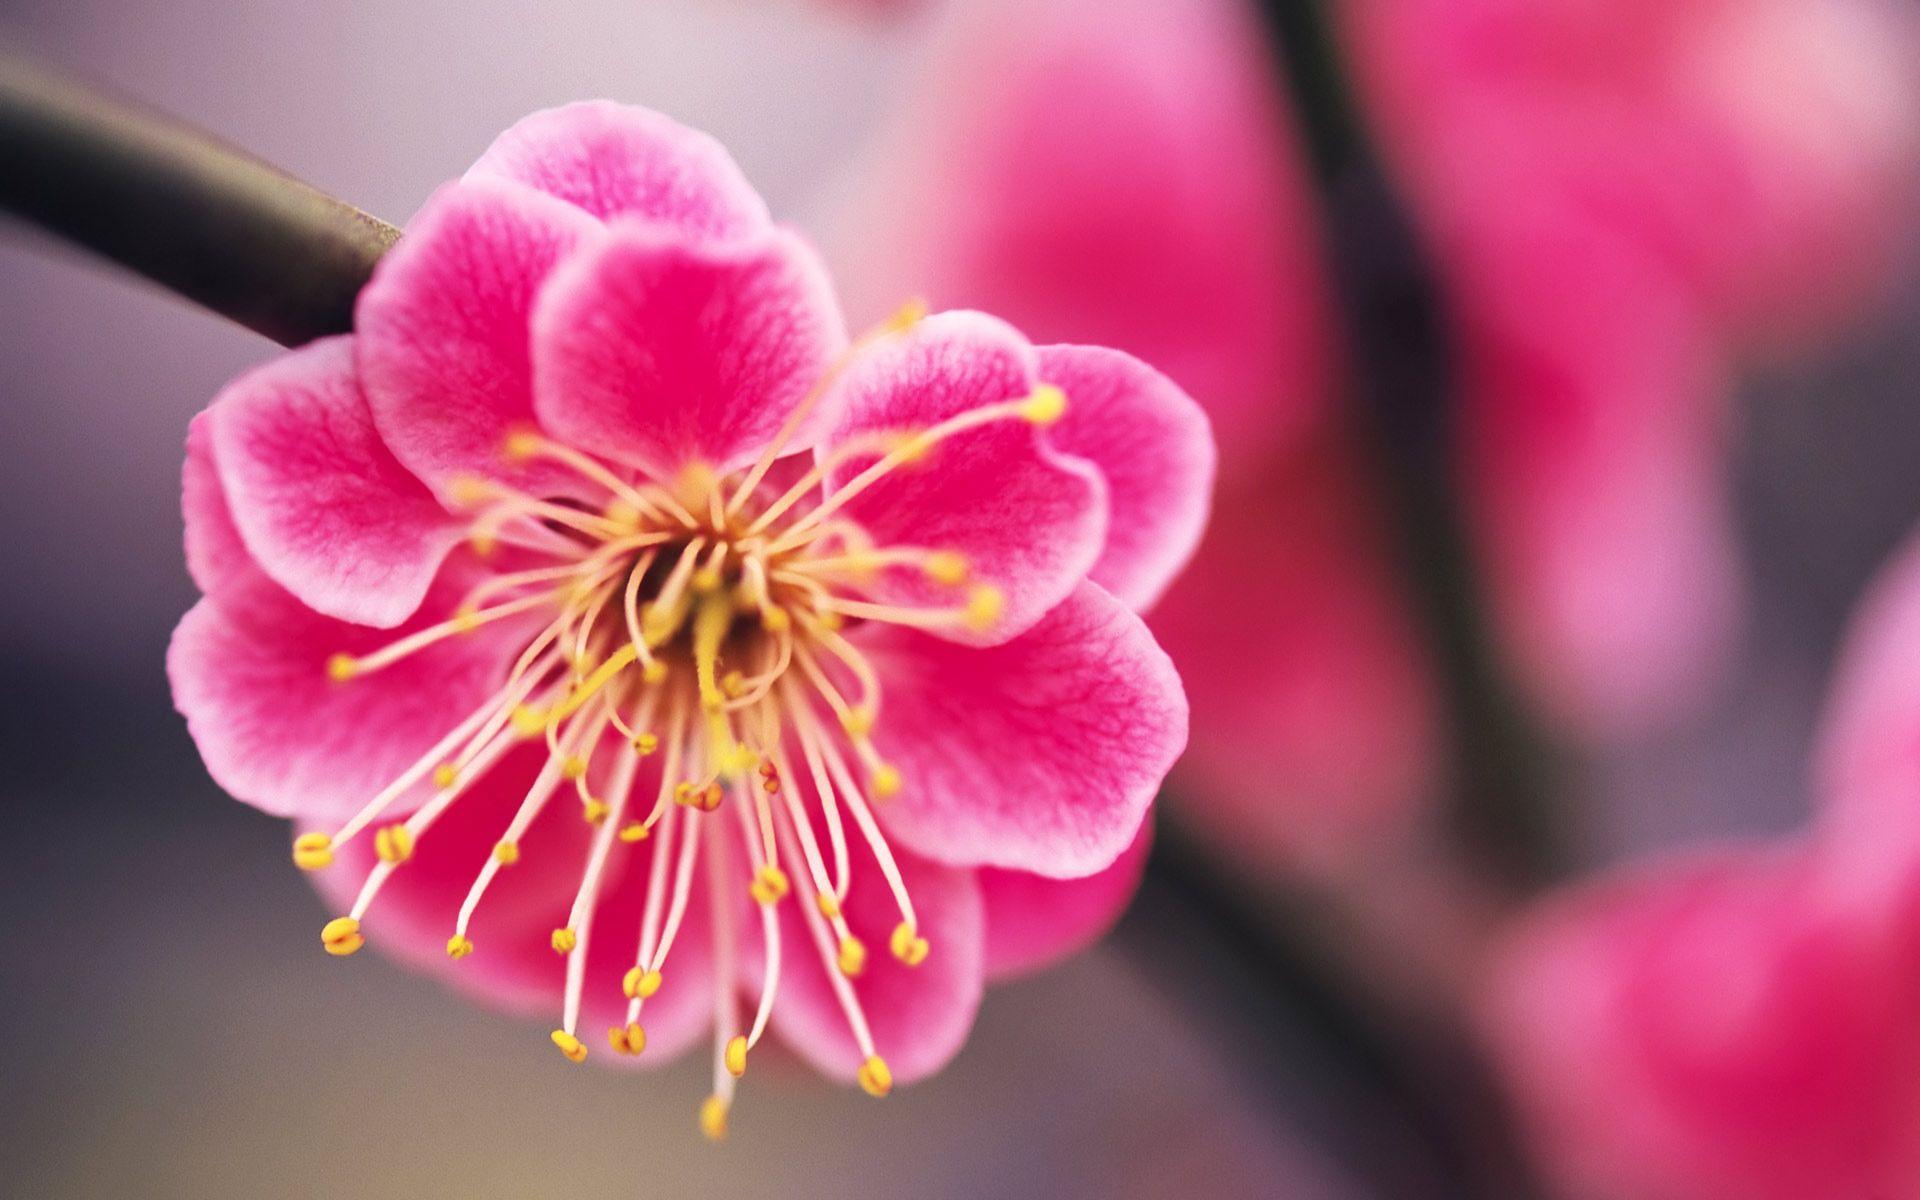 Pink Flowers Beautiful pink Flower Hd Wallpaper Desktop